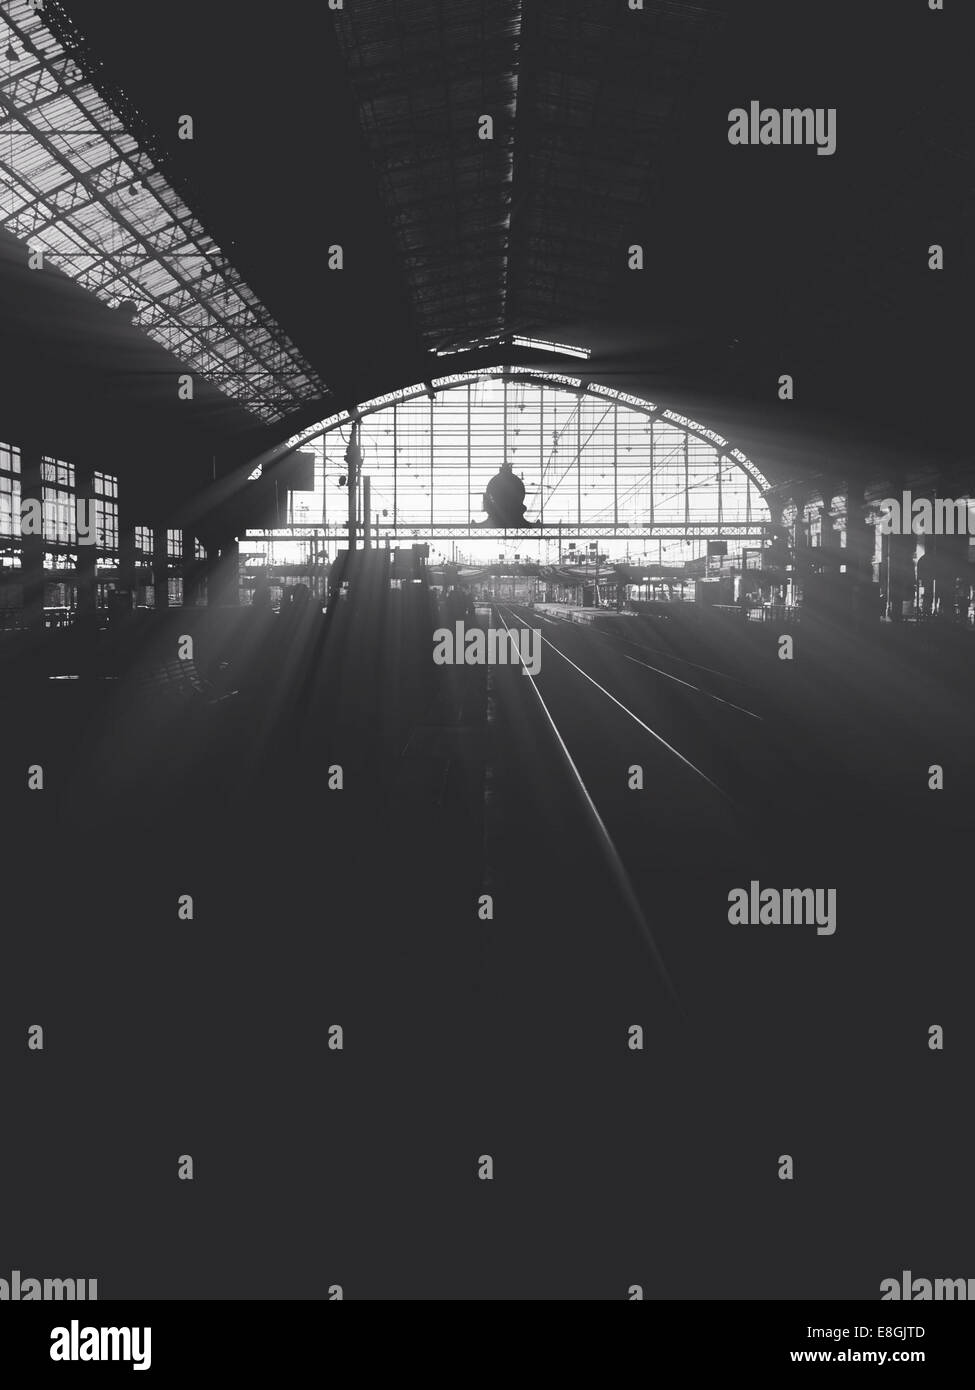 Frankreich, Aquitanien, Gironde, Bordeaux, hinterleuchtete Bahnhof Stockbild